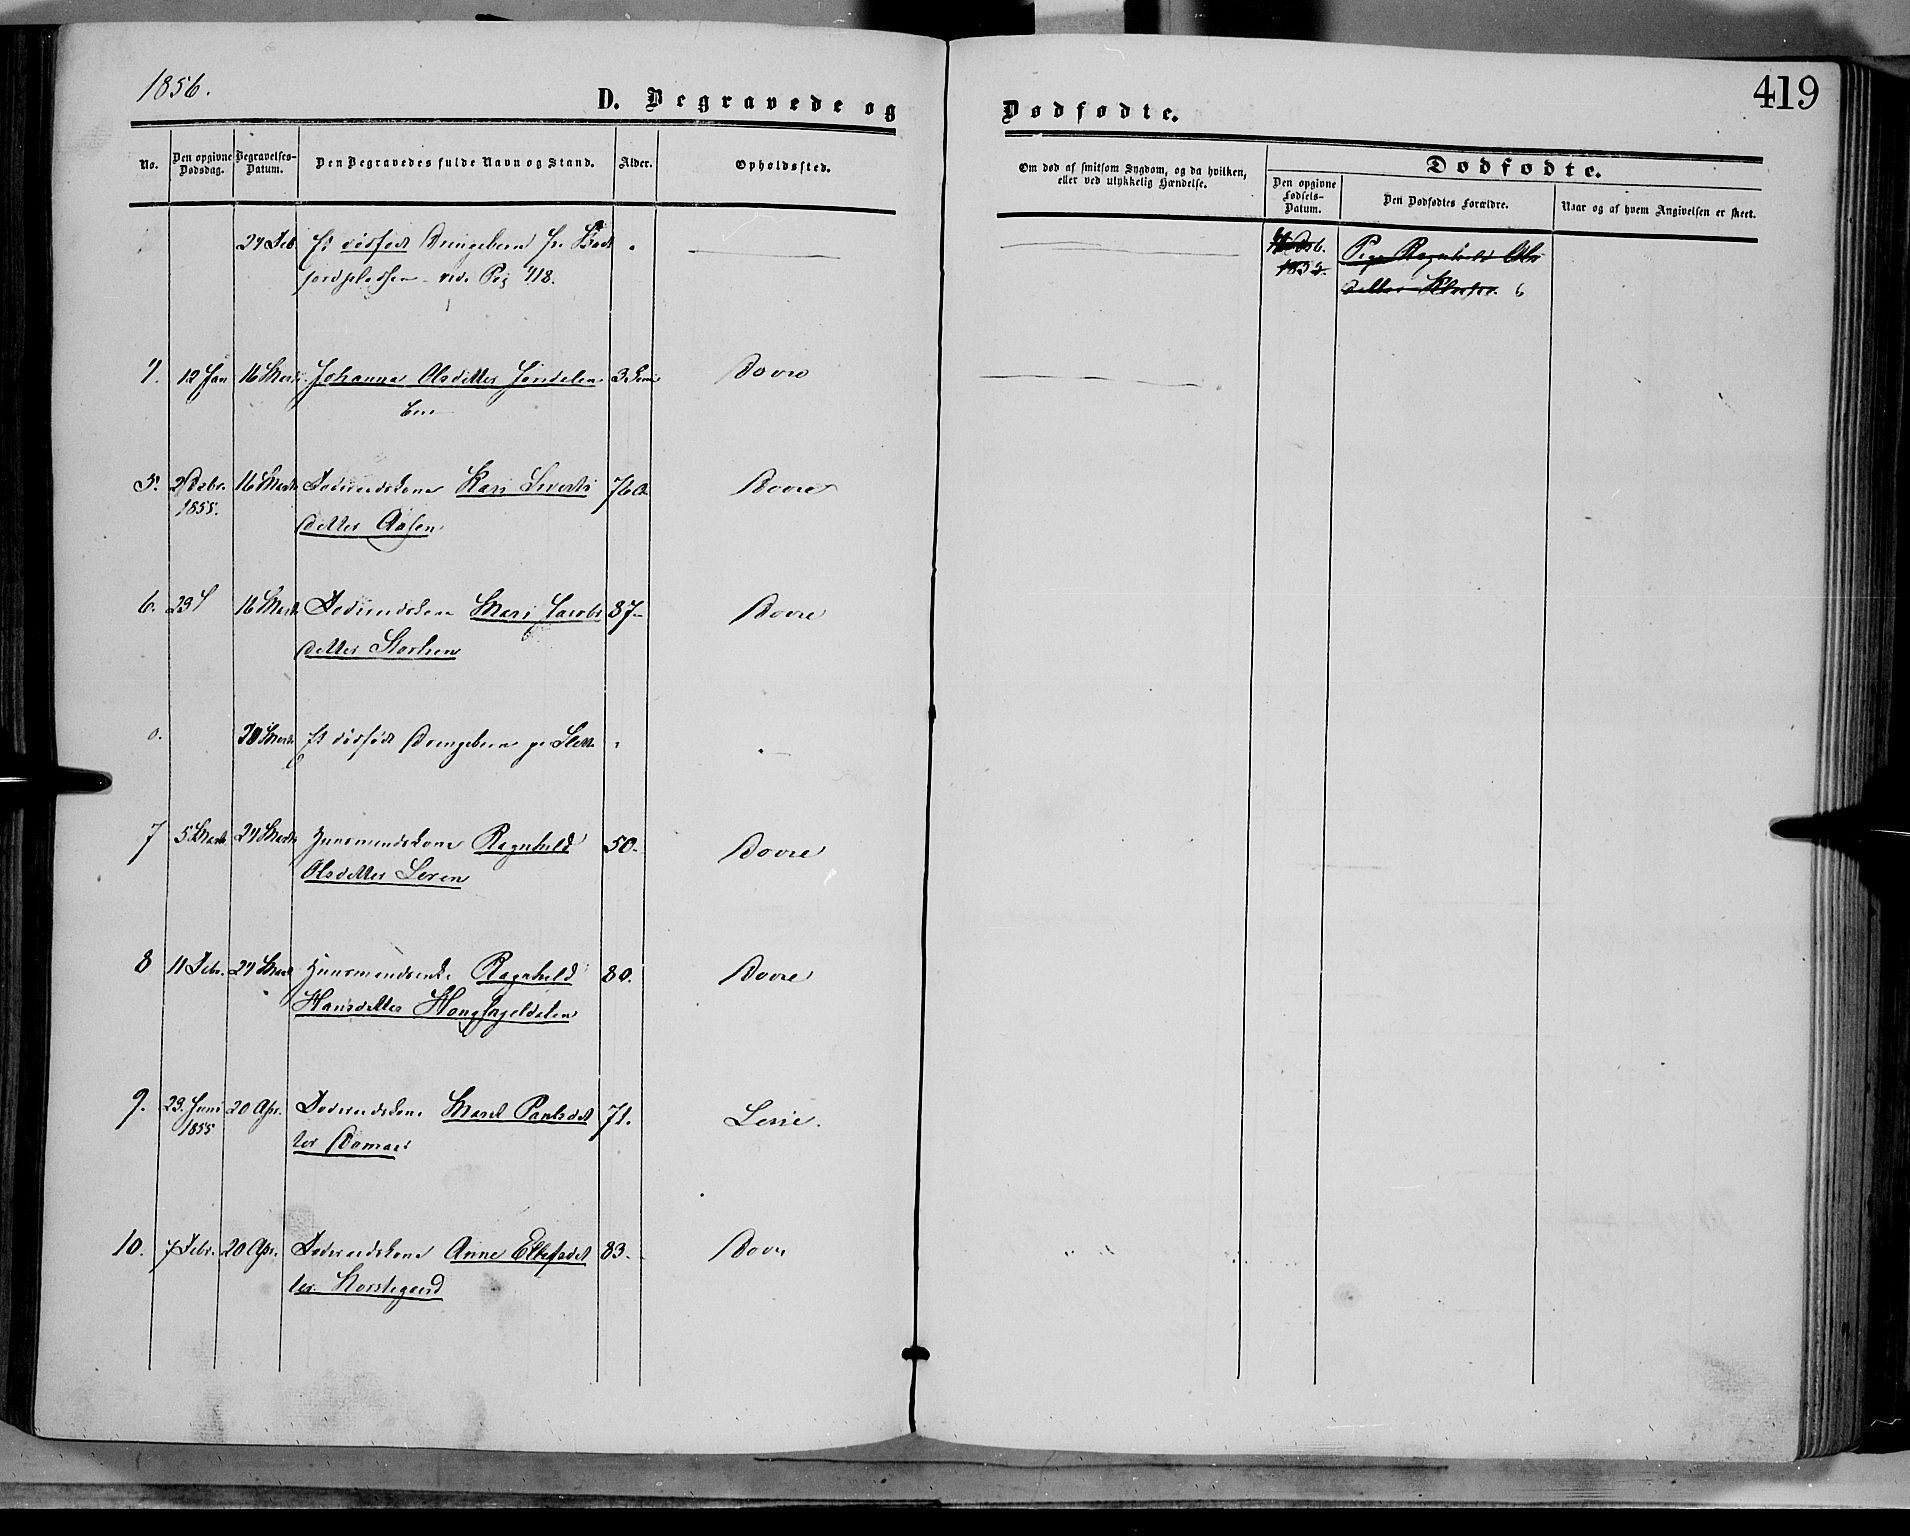 SAH, Dovre prestekontor, Ministerialbok nr. 1, 1854-1878, s. 419